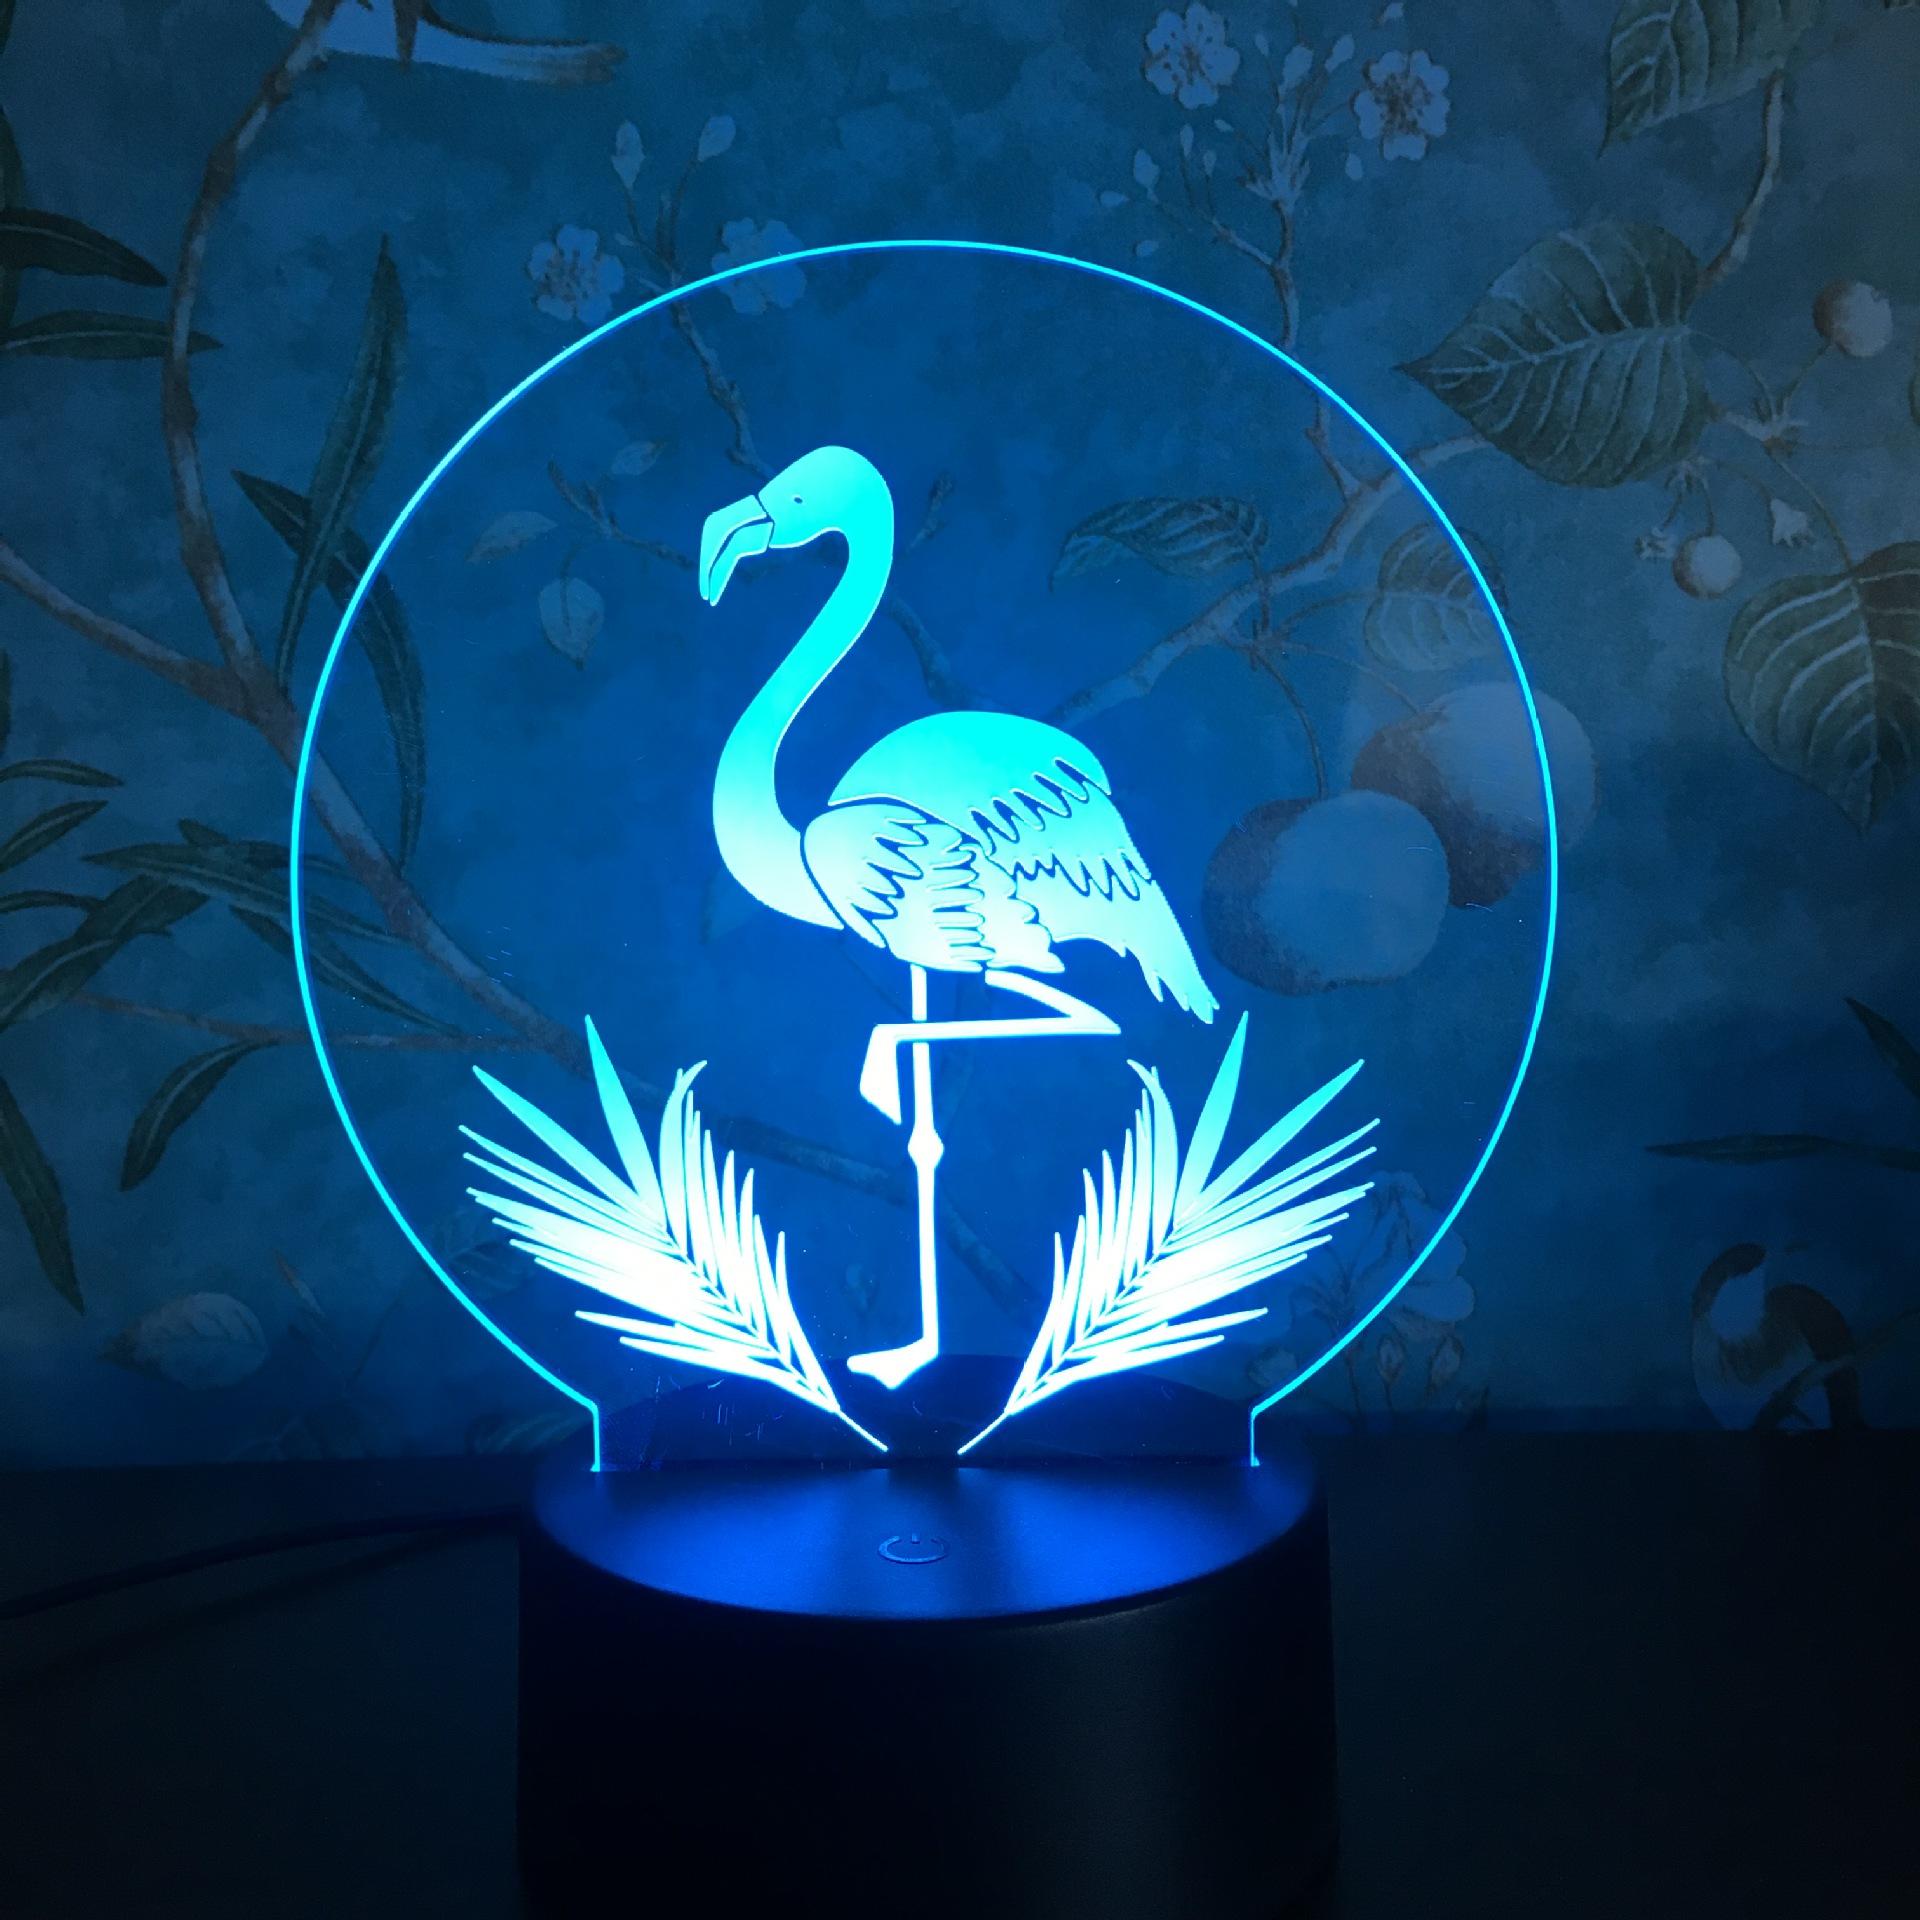 3DNightLightTouchцветfulFlamingo LED Таблица Лампа День рождения